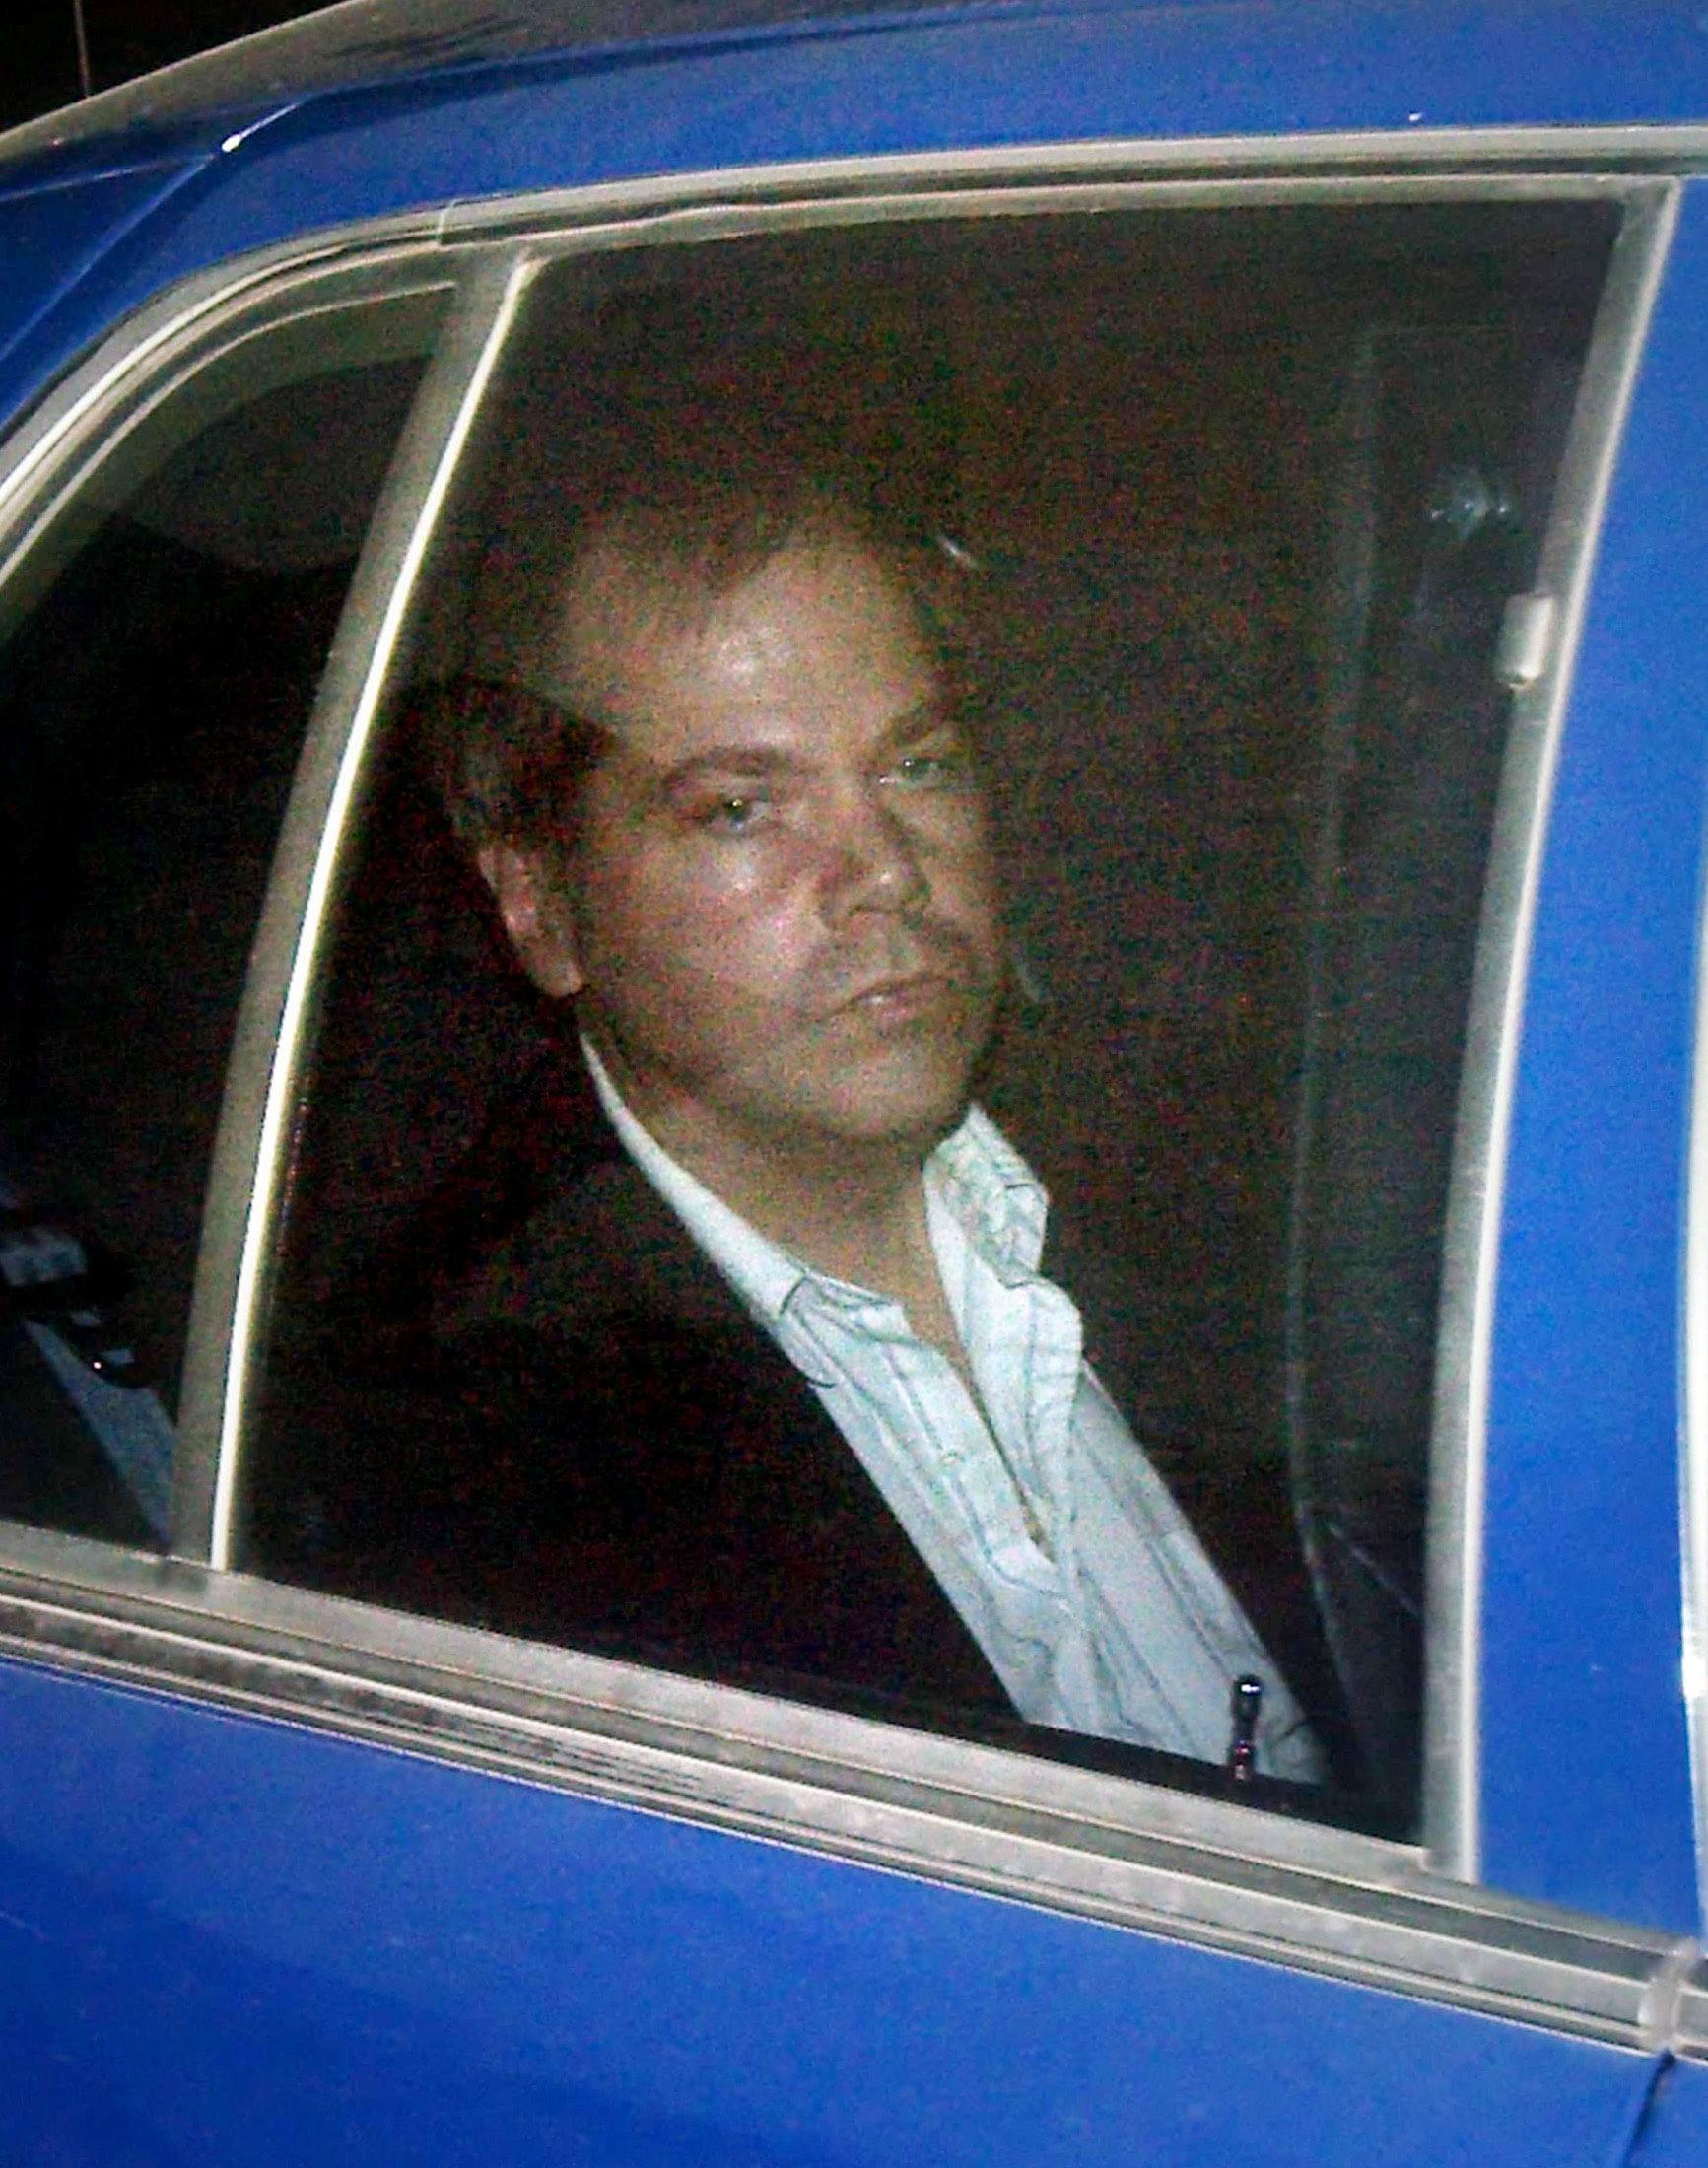 John Hinckley Jr. arrives at the E. Barrett Prettyman U.S. District Court in Washington November 19, 2003.